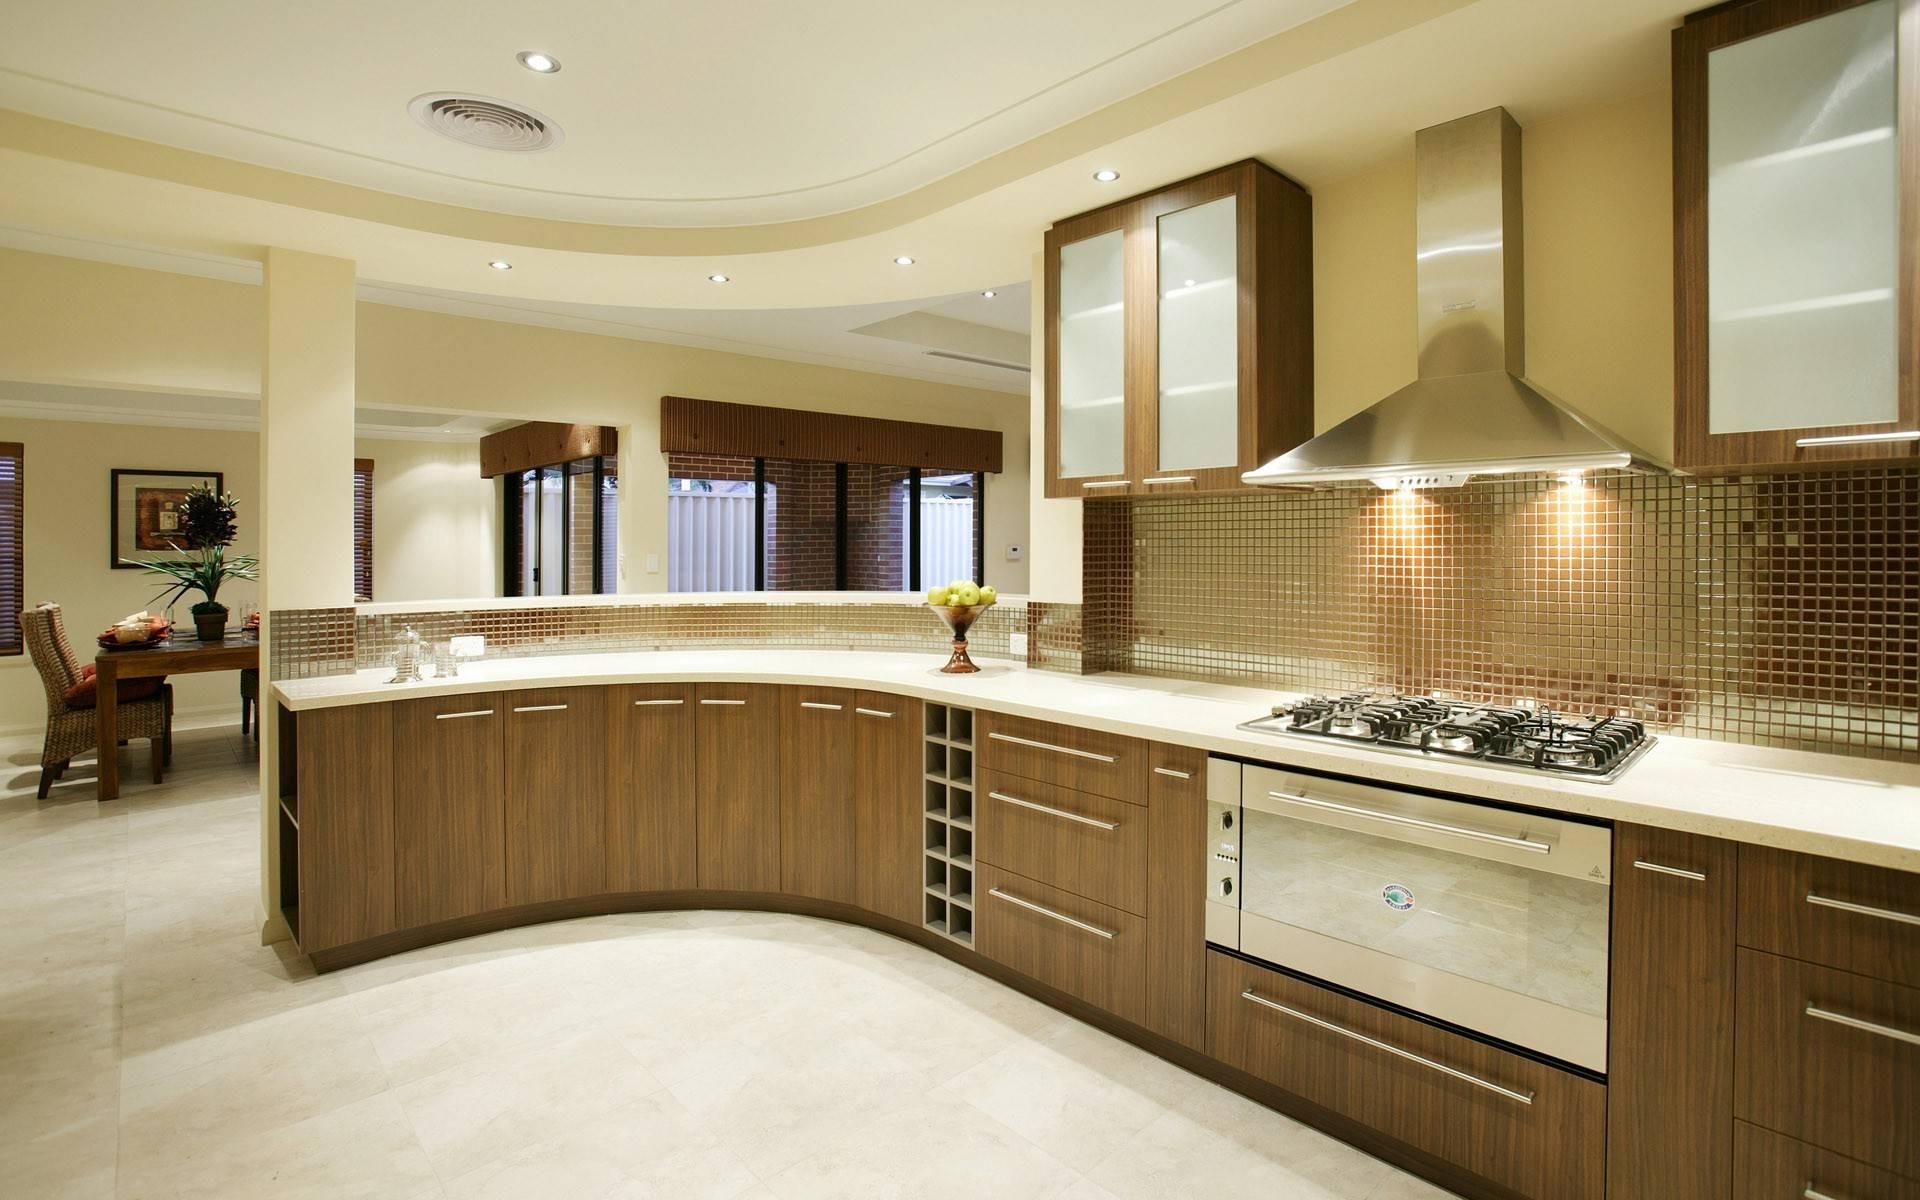 interior-design-ideas-for-kitchen-innovative-with-image-of-interior-design-plans-free-on-design.jpg